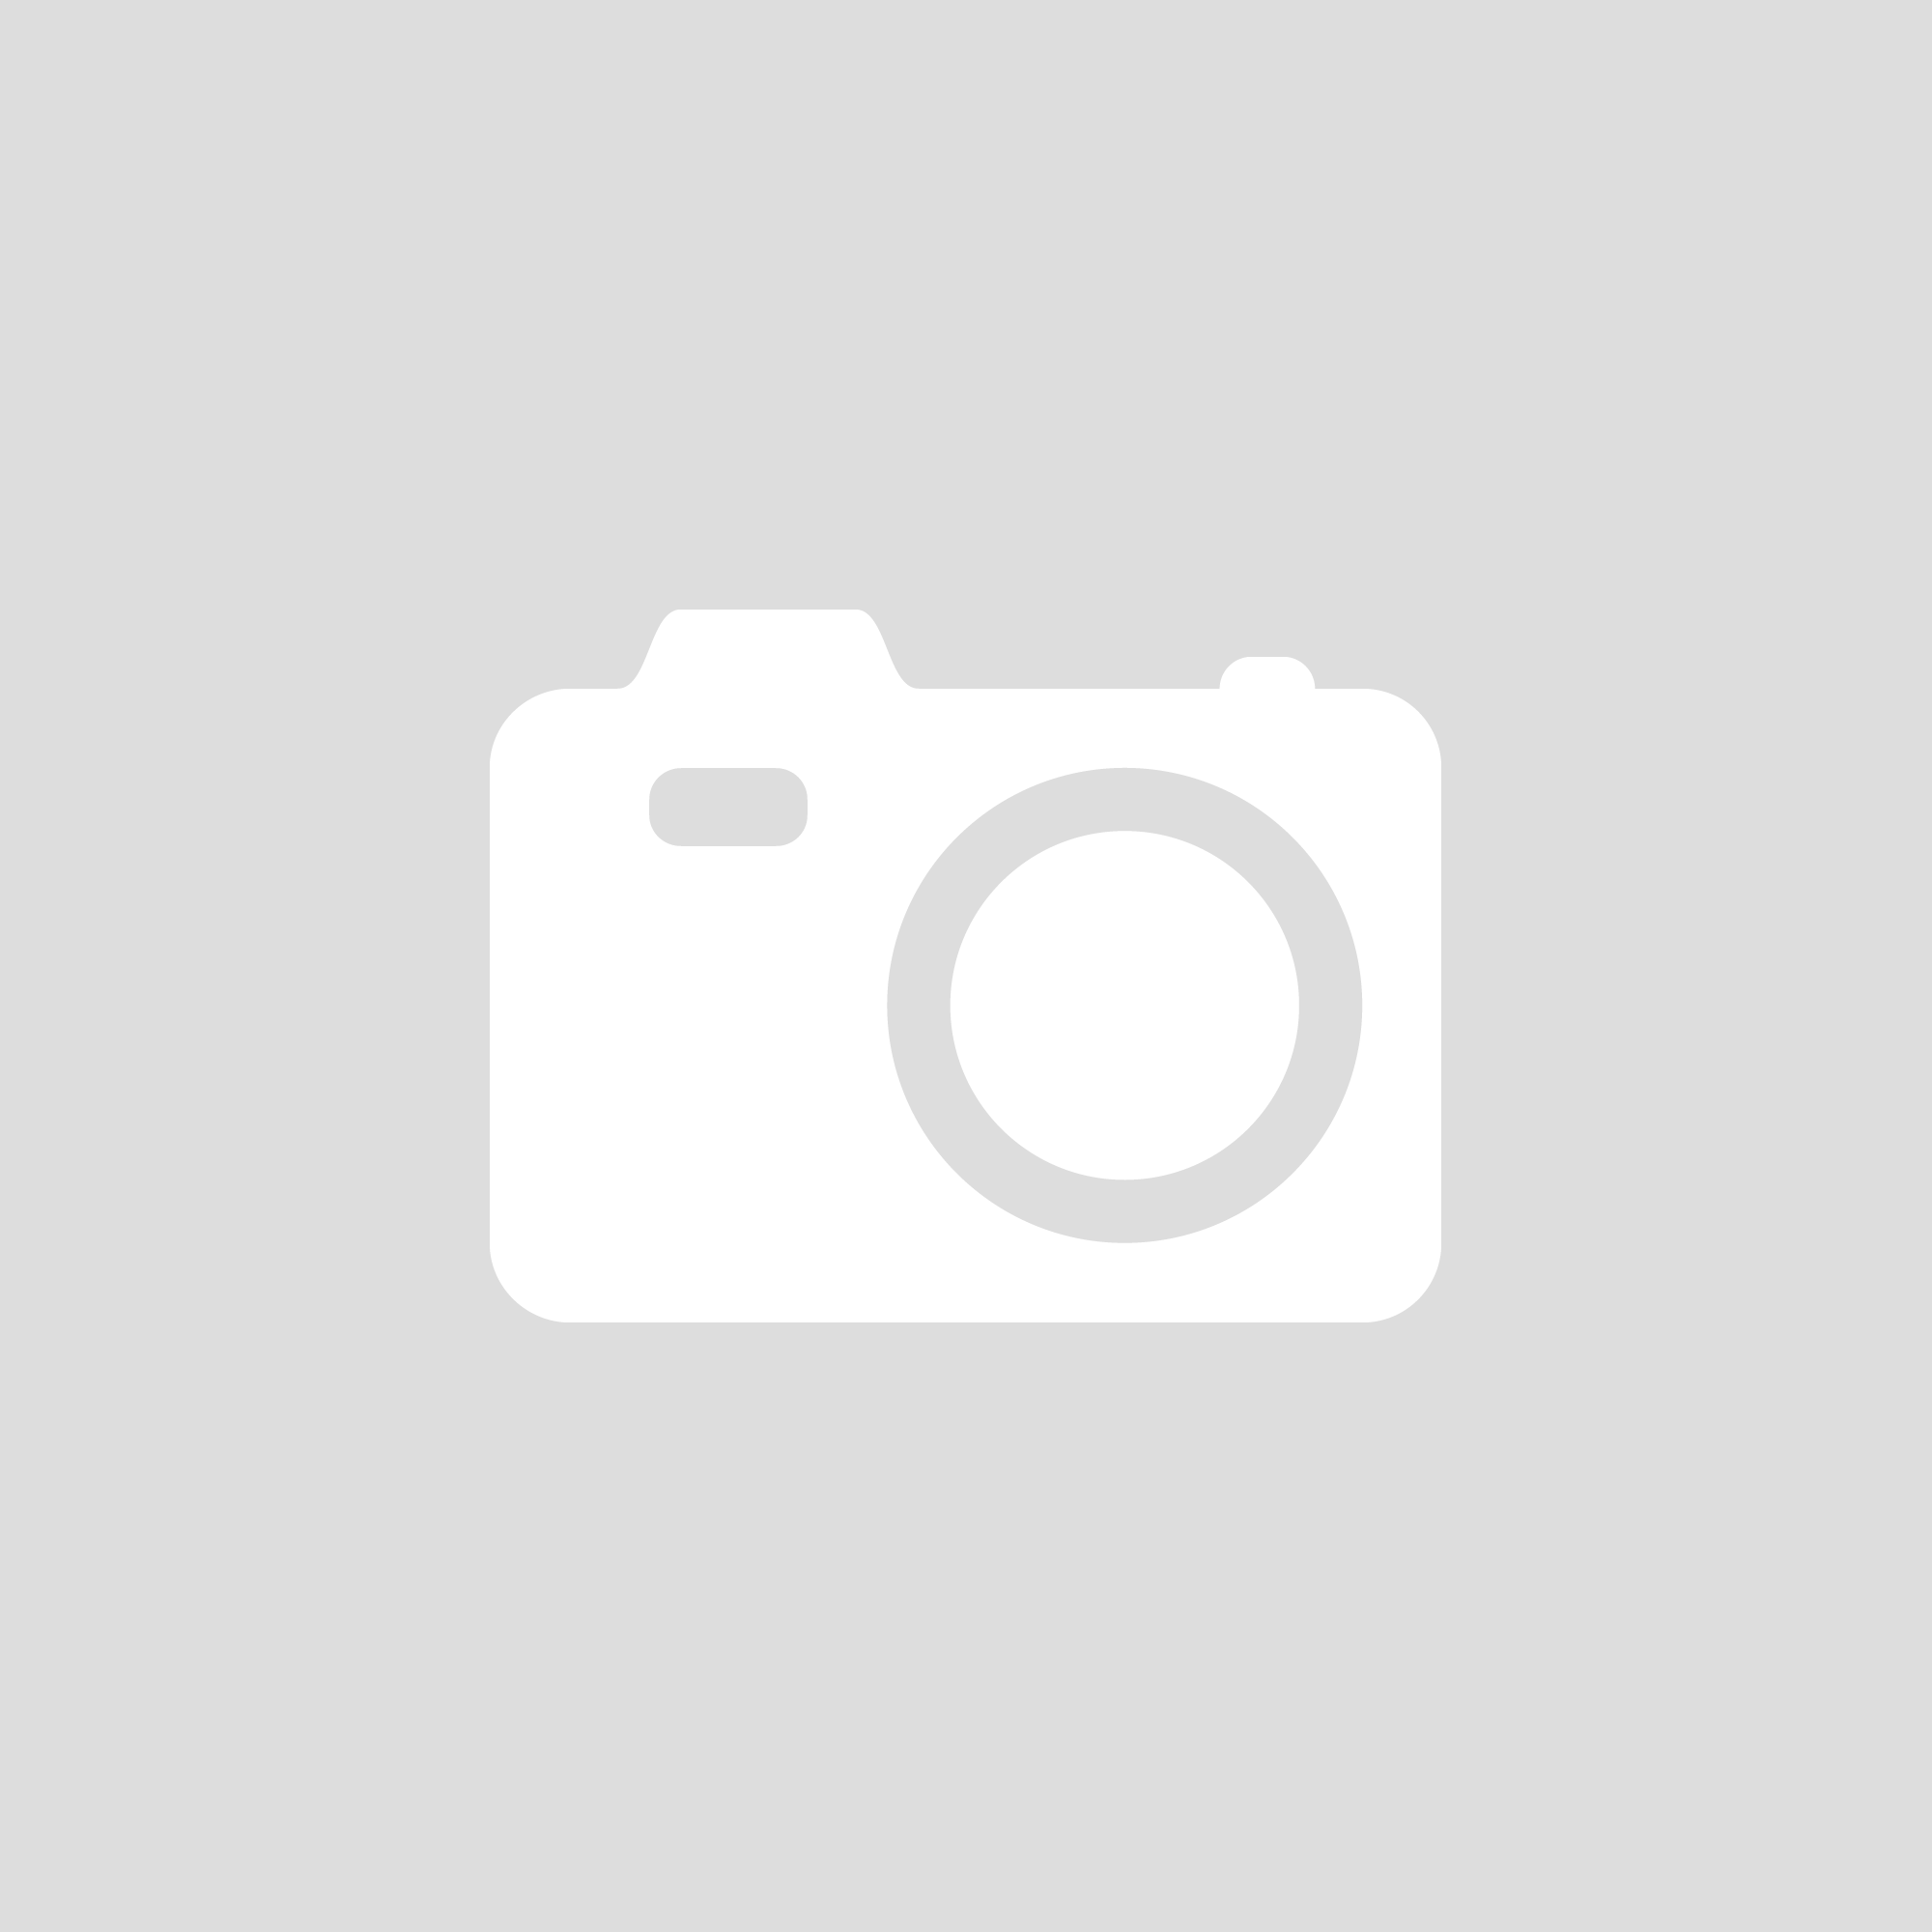 Diamond Triple Tealight Holder With Black Sparkling Base From CIMC